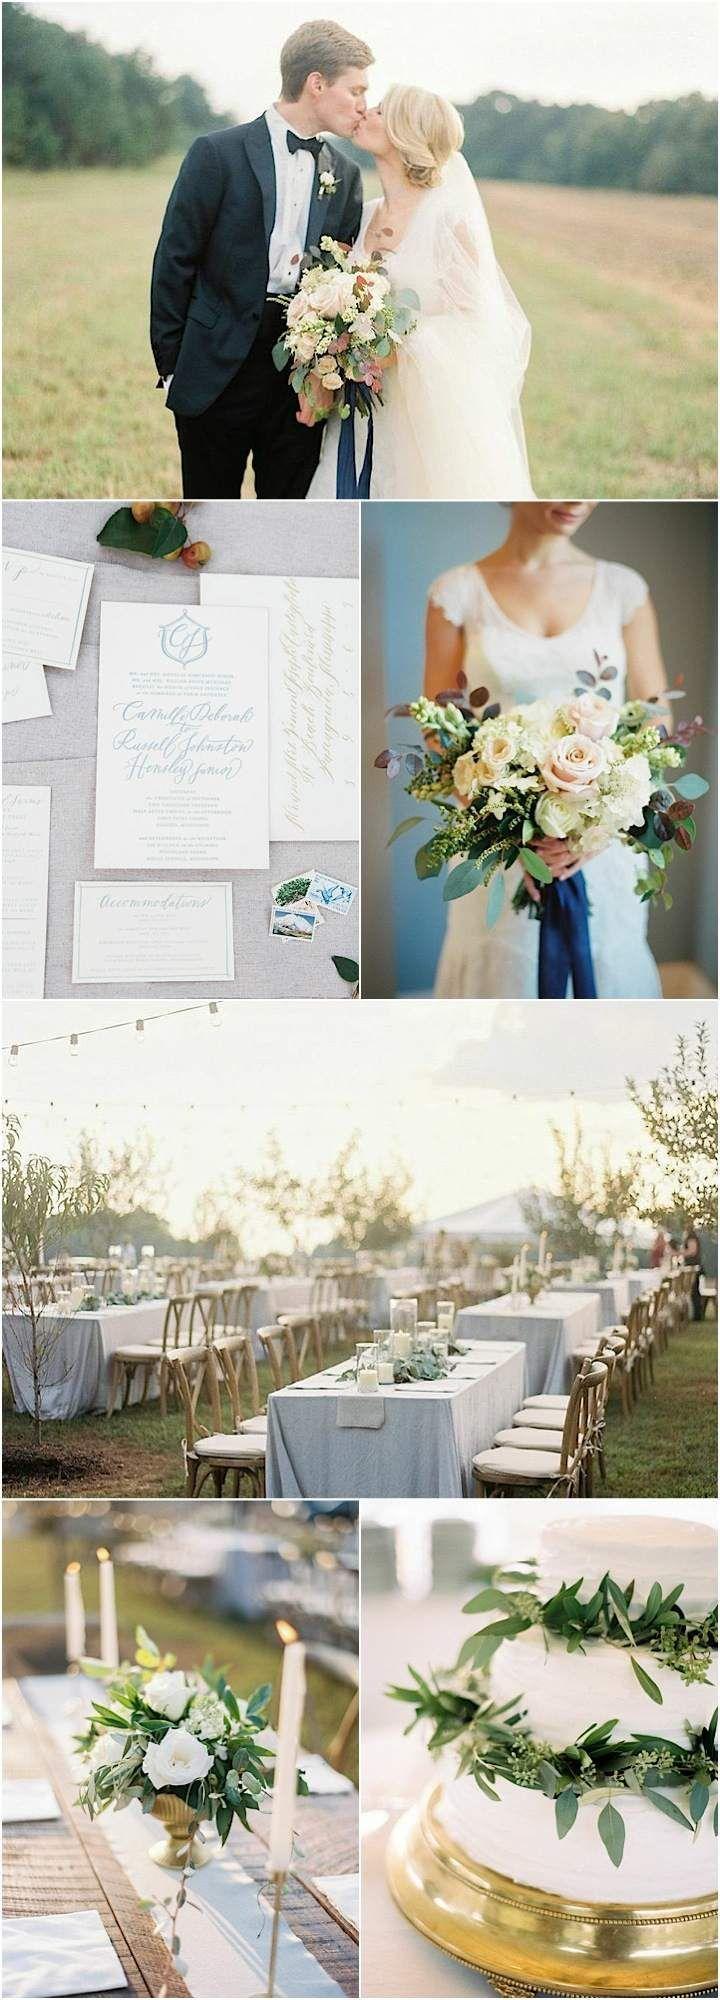 Dorable Dusty Blue Wedding Theme Vignette - The Wedding Ideas ...